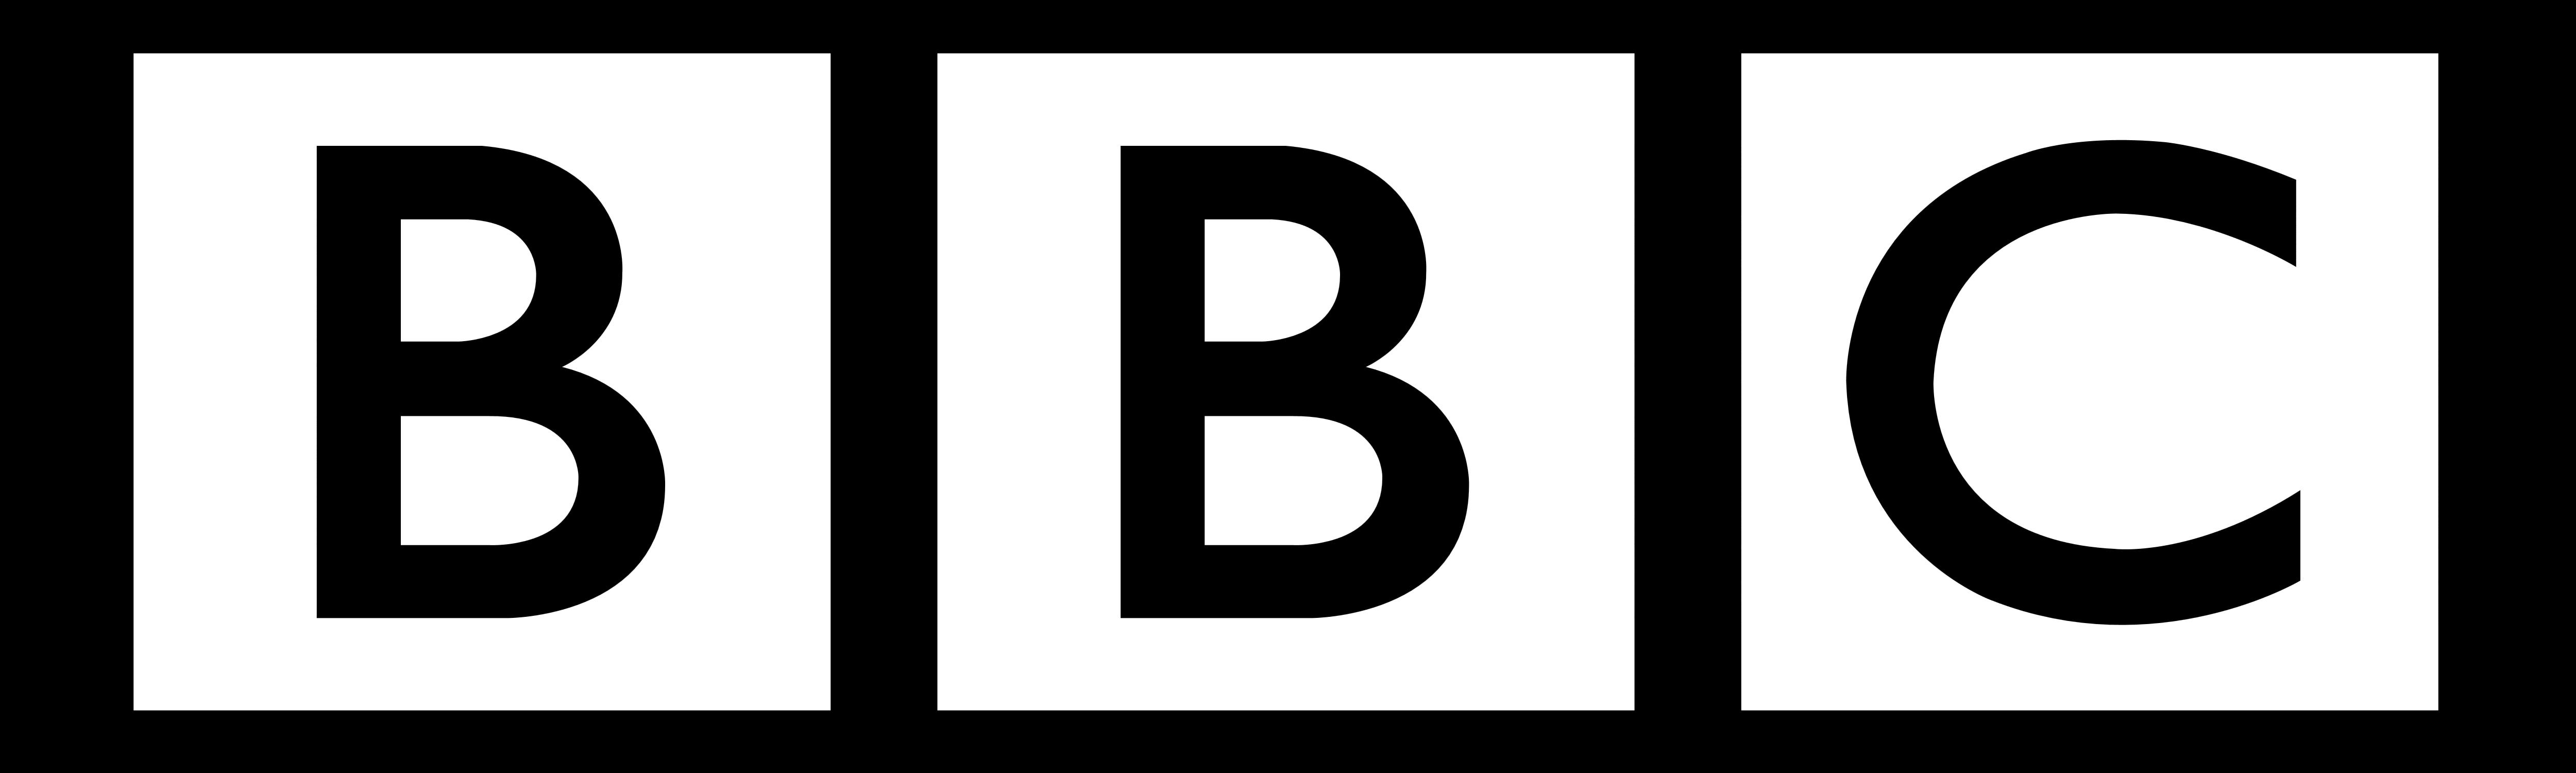 https://www.bbc.co.uk/bbcthree/article/158a7037-d522-43d1-b8f3-aef515278c77